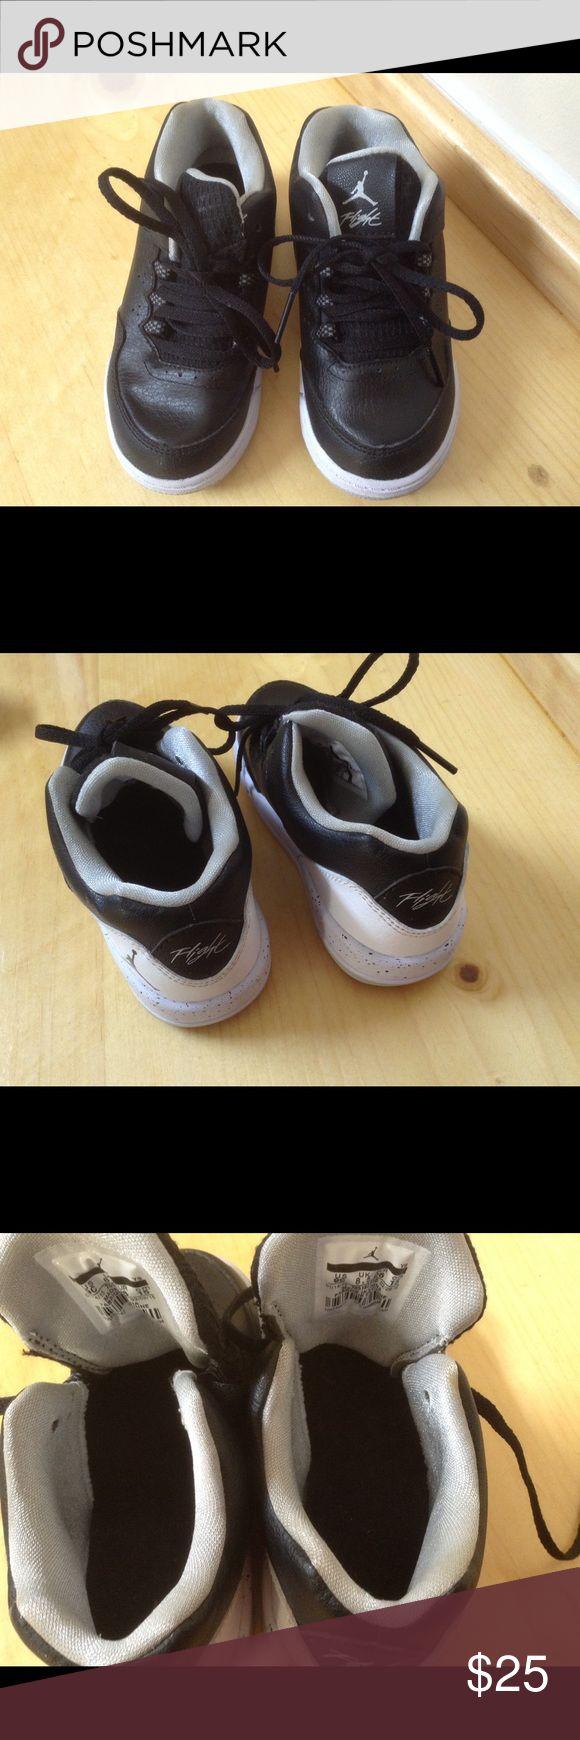 Boy's toddler Jordan Flight origin 2 Leather. Worn a few times. Great condition Jordan Shoes Sneakers